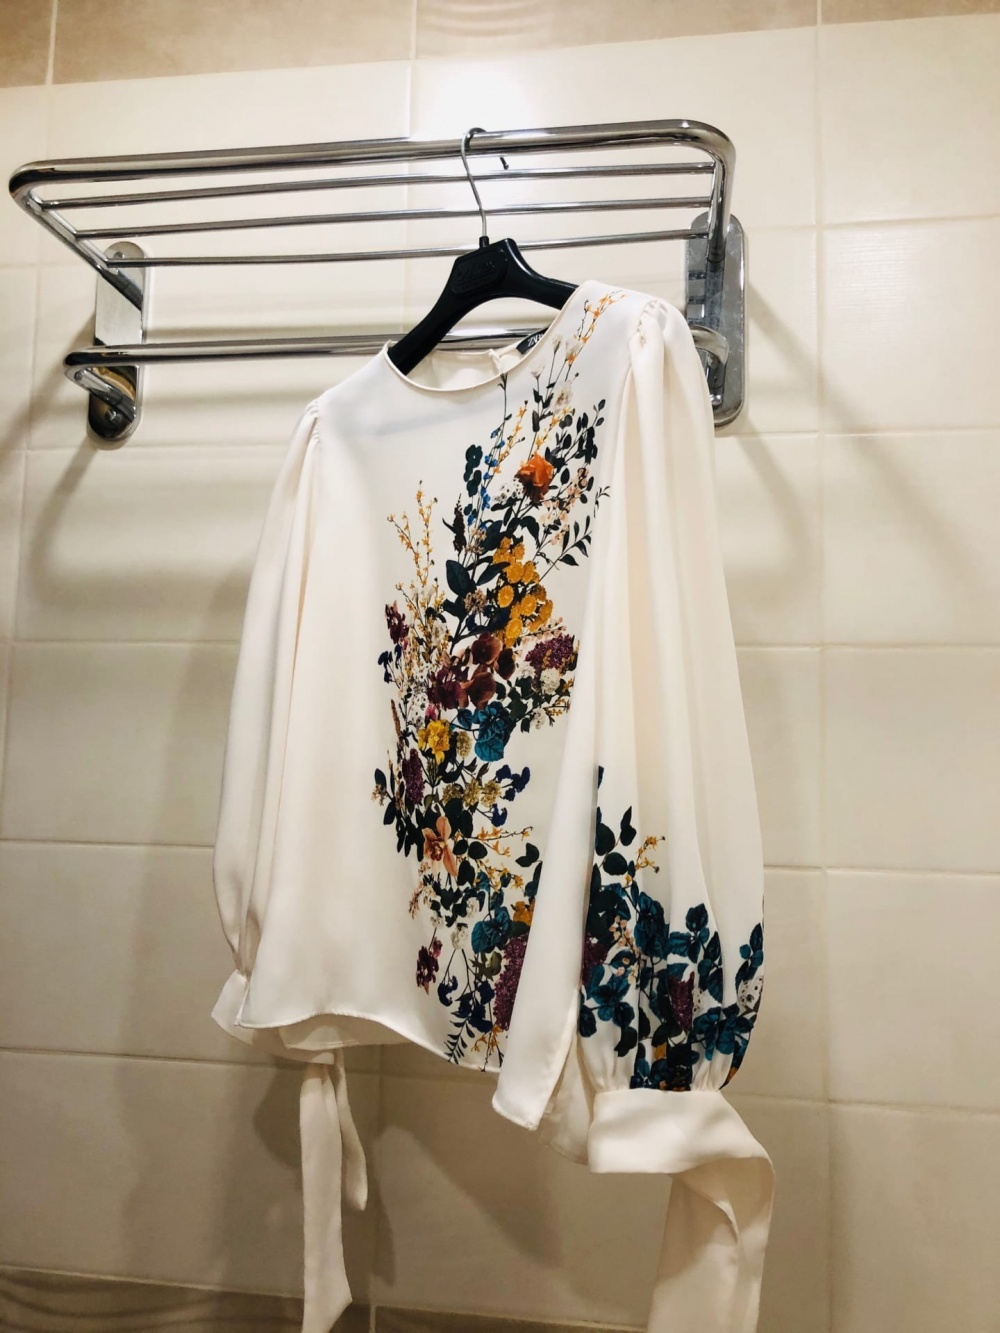 Блузка ZARA. Размер S-M.